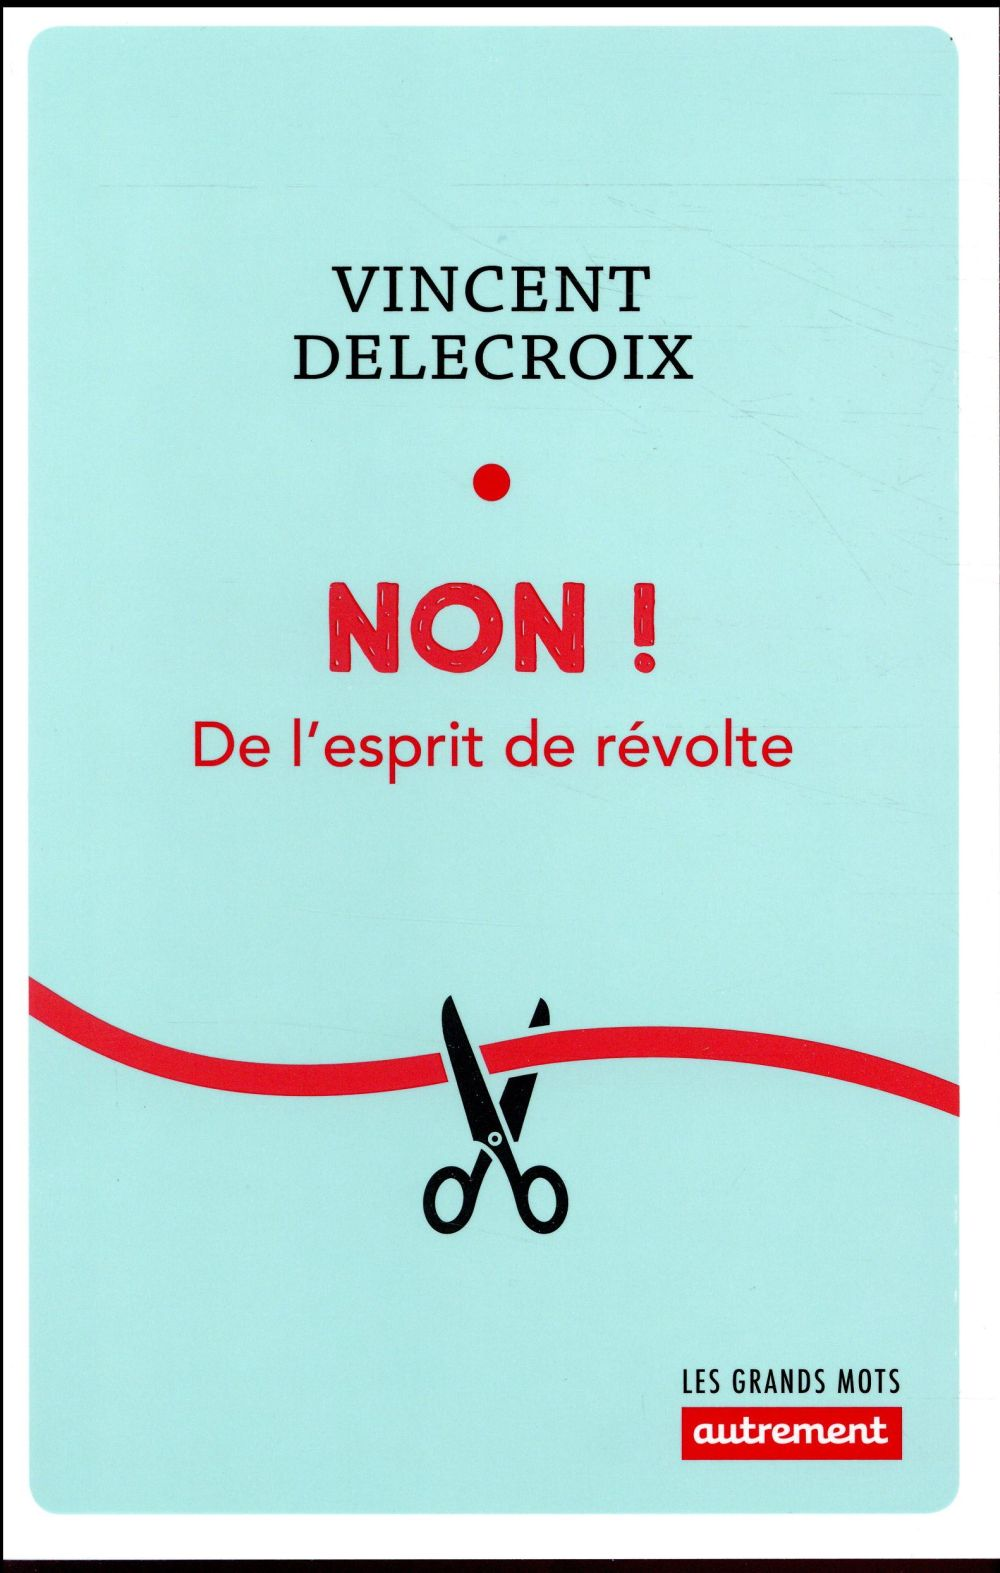 NON ! - DE L'ESPRIT DE REVOLTE